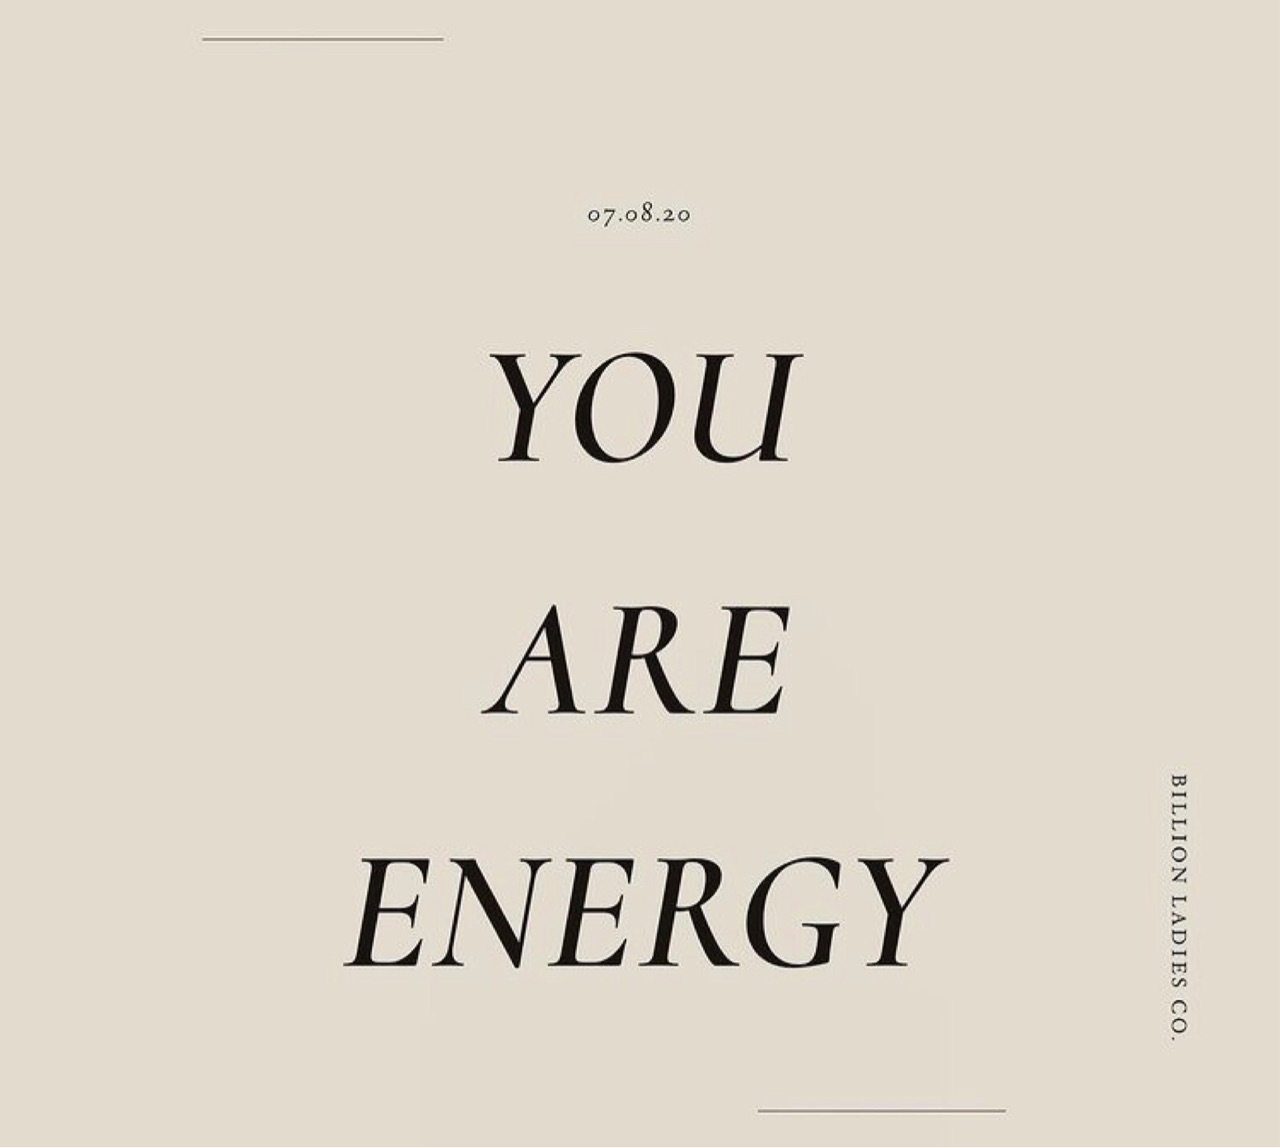 energy, inspo, and motivation image